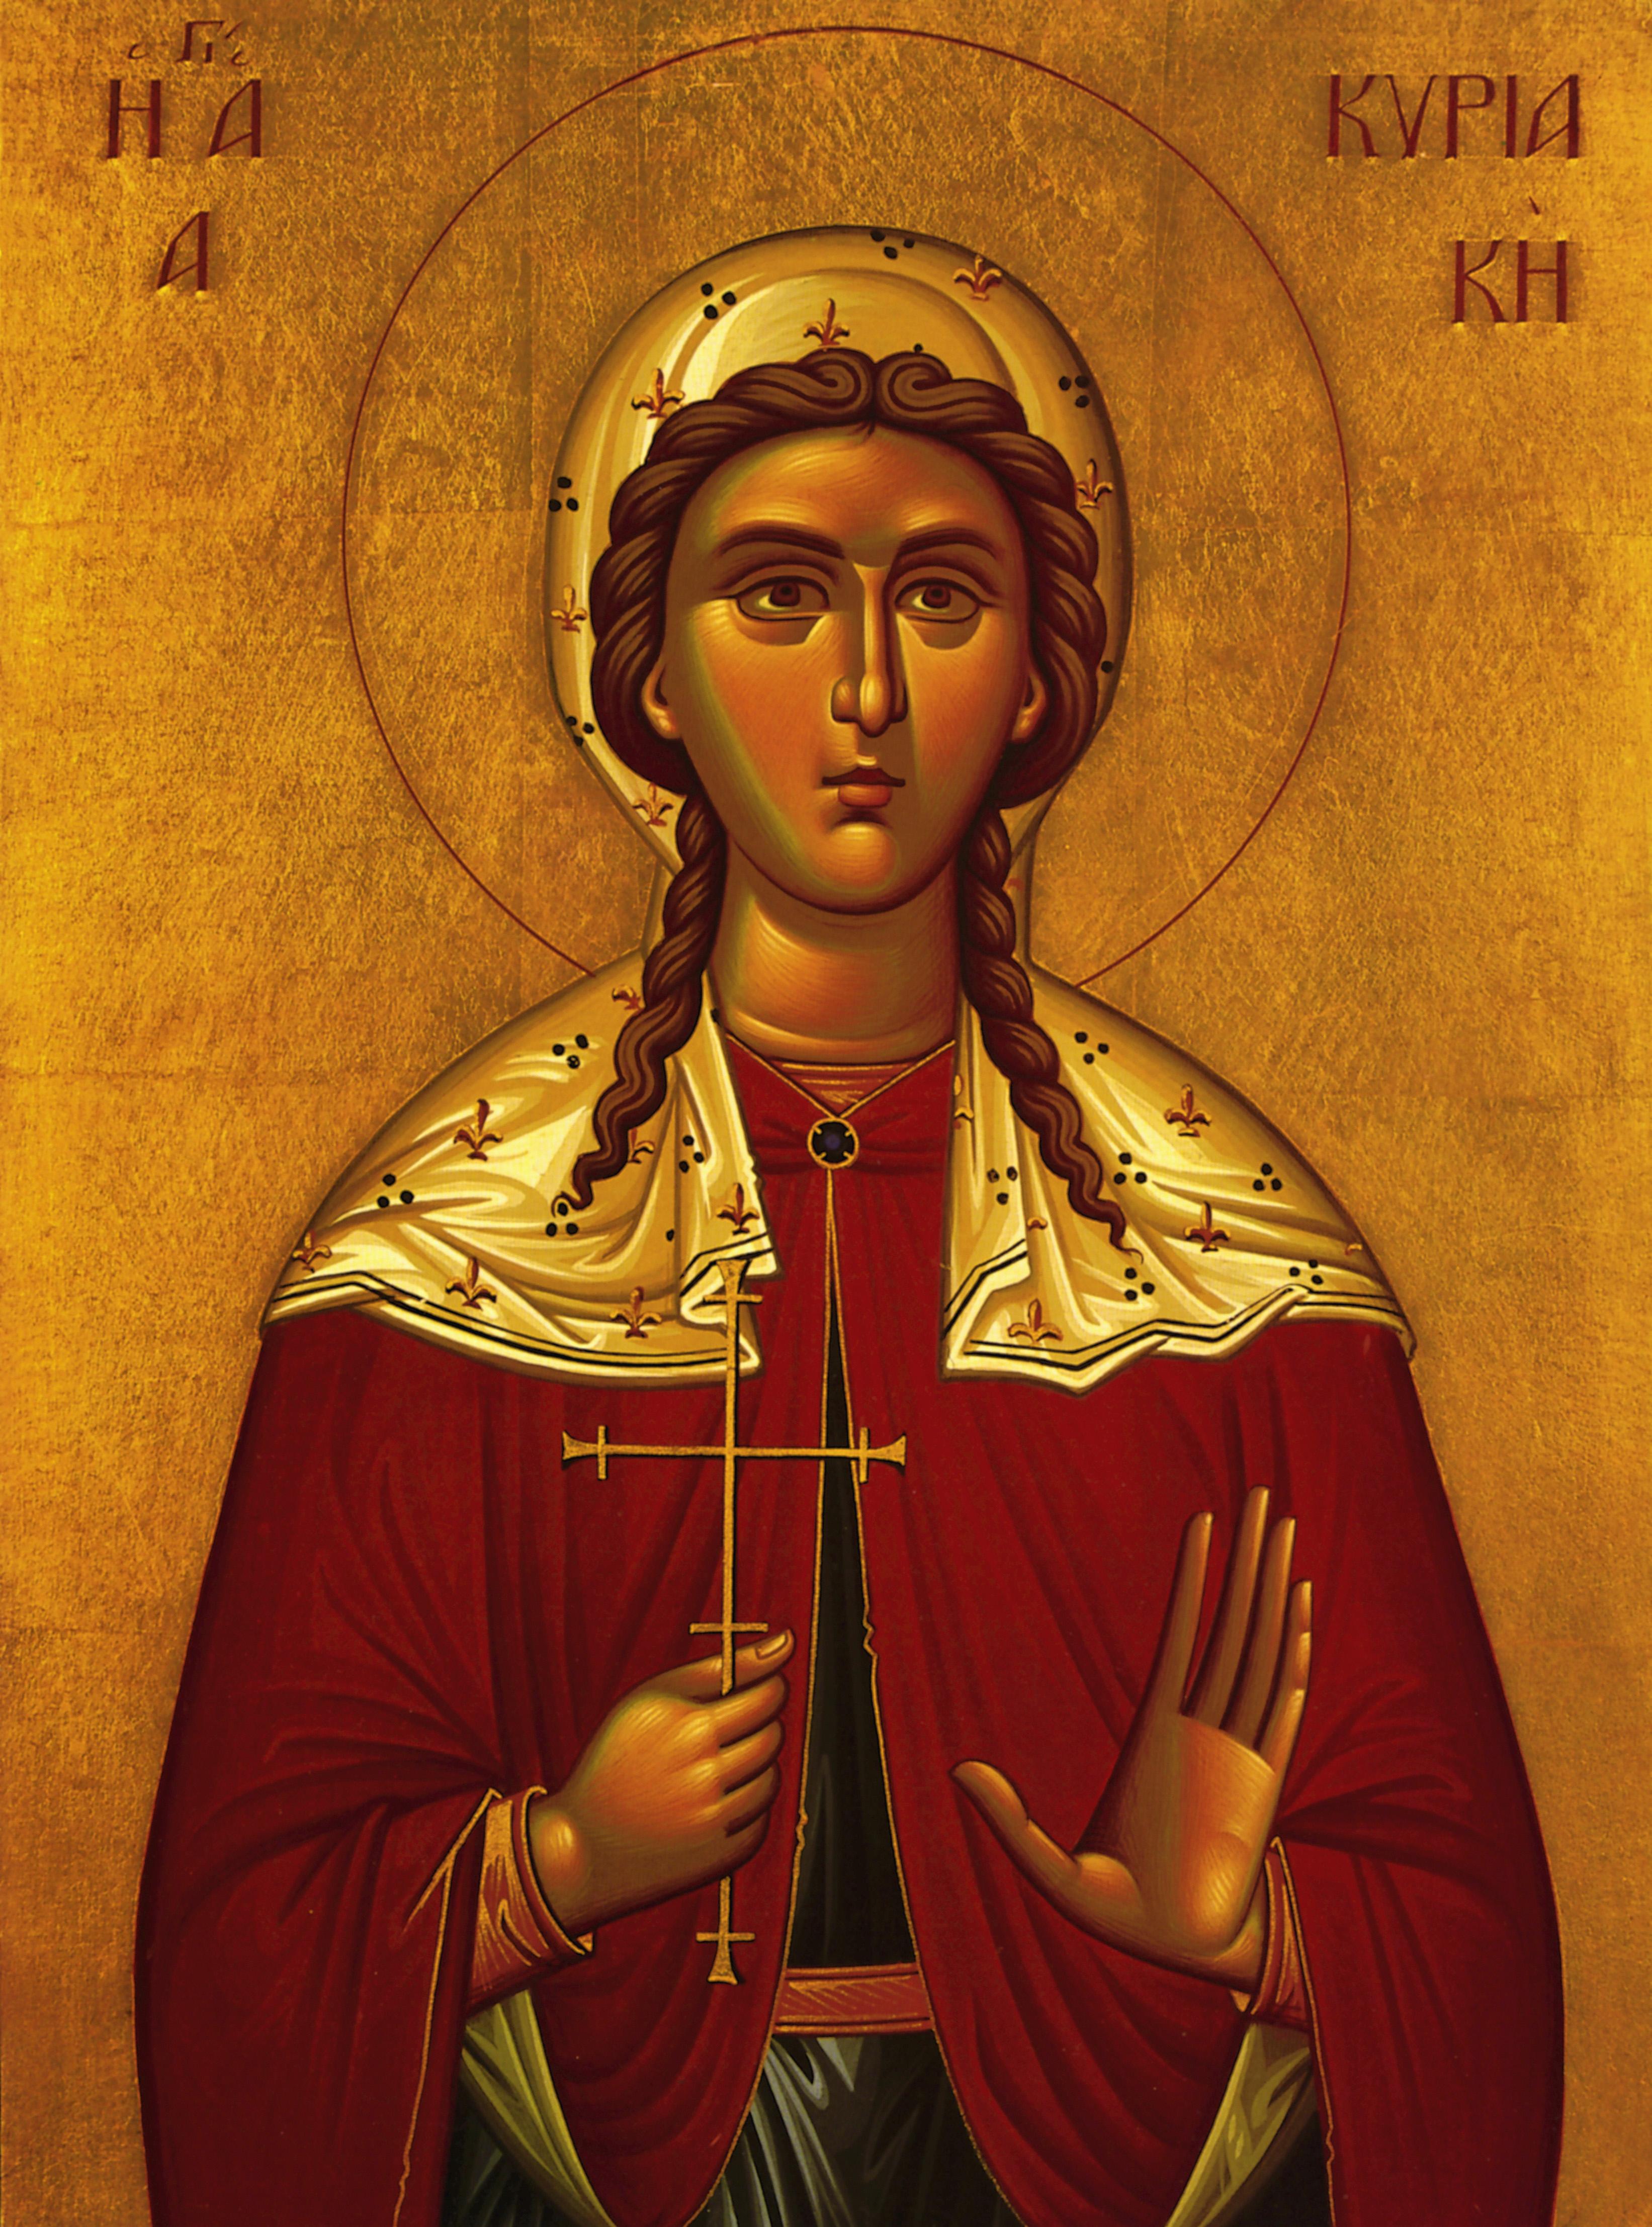 Aγία Κυριακή: Χριστιανή στη ζωή και στο θάνατο…